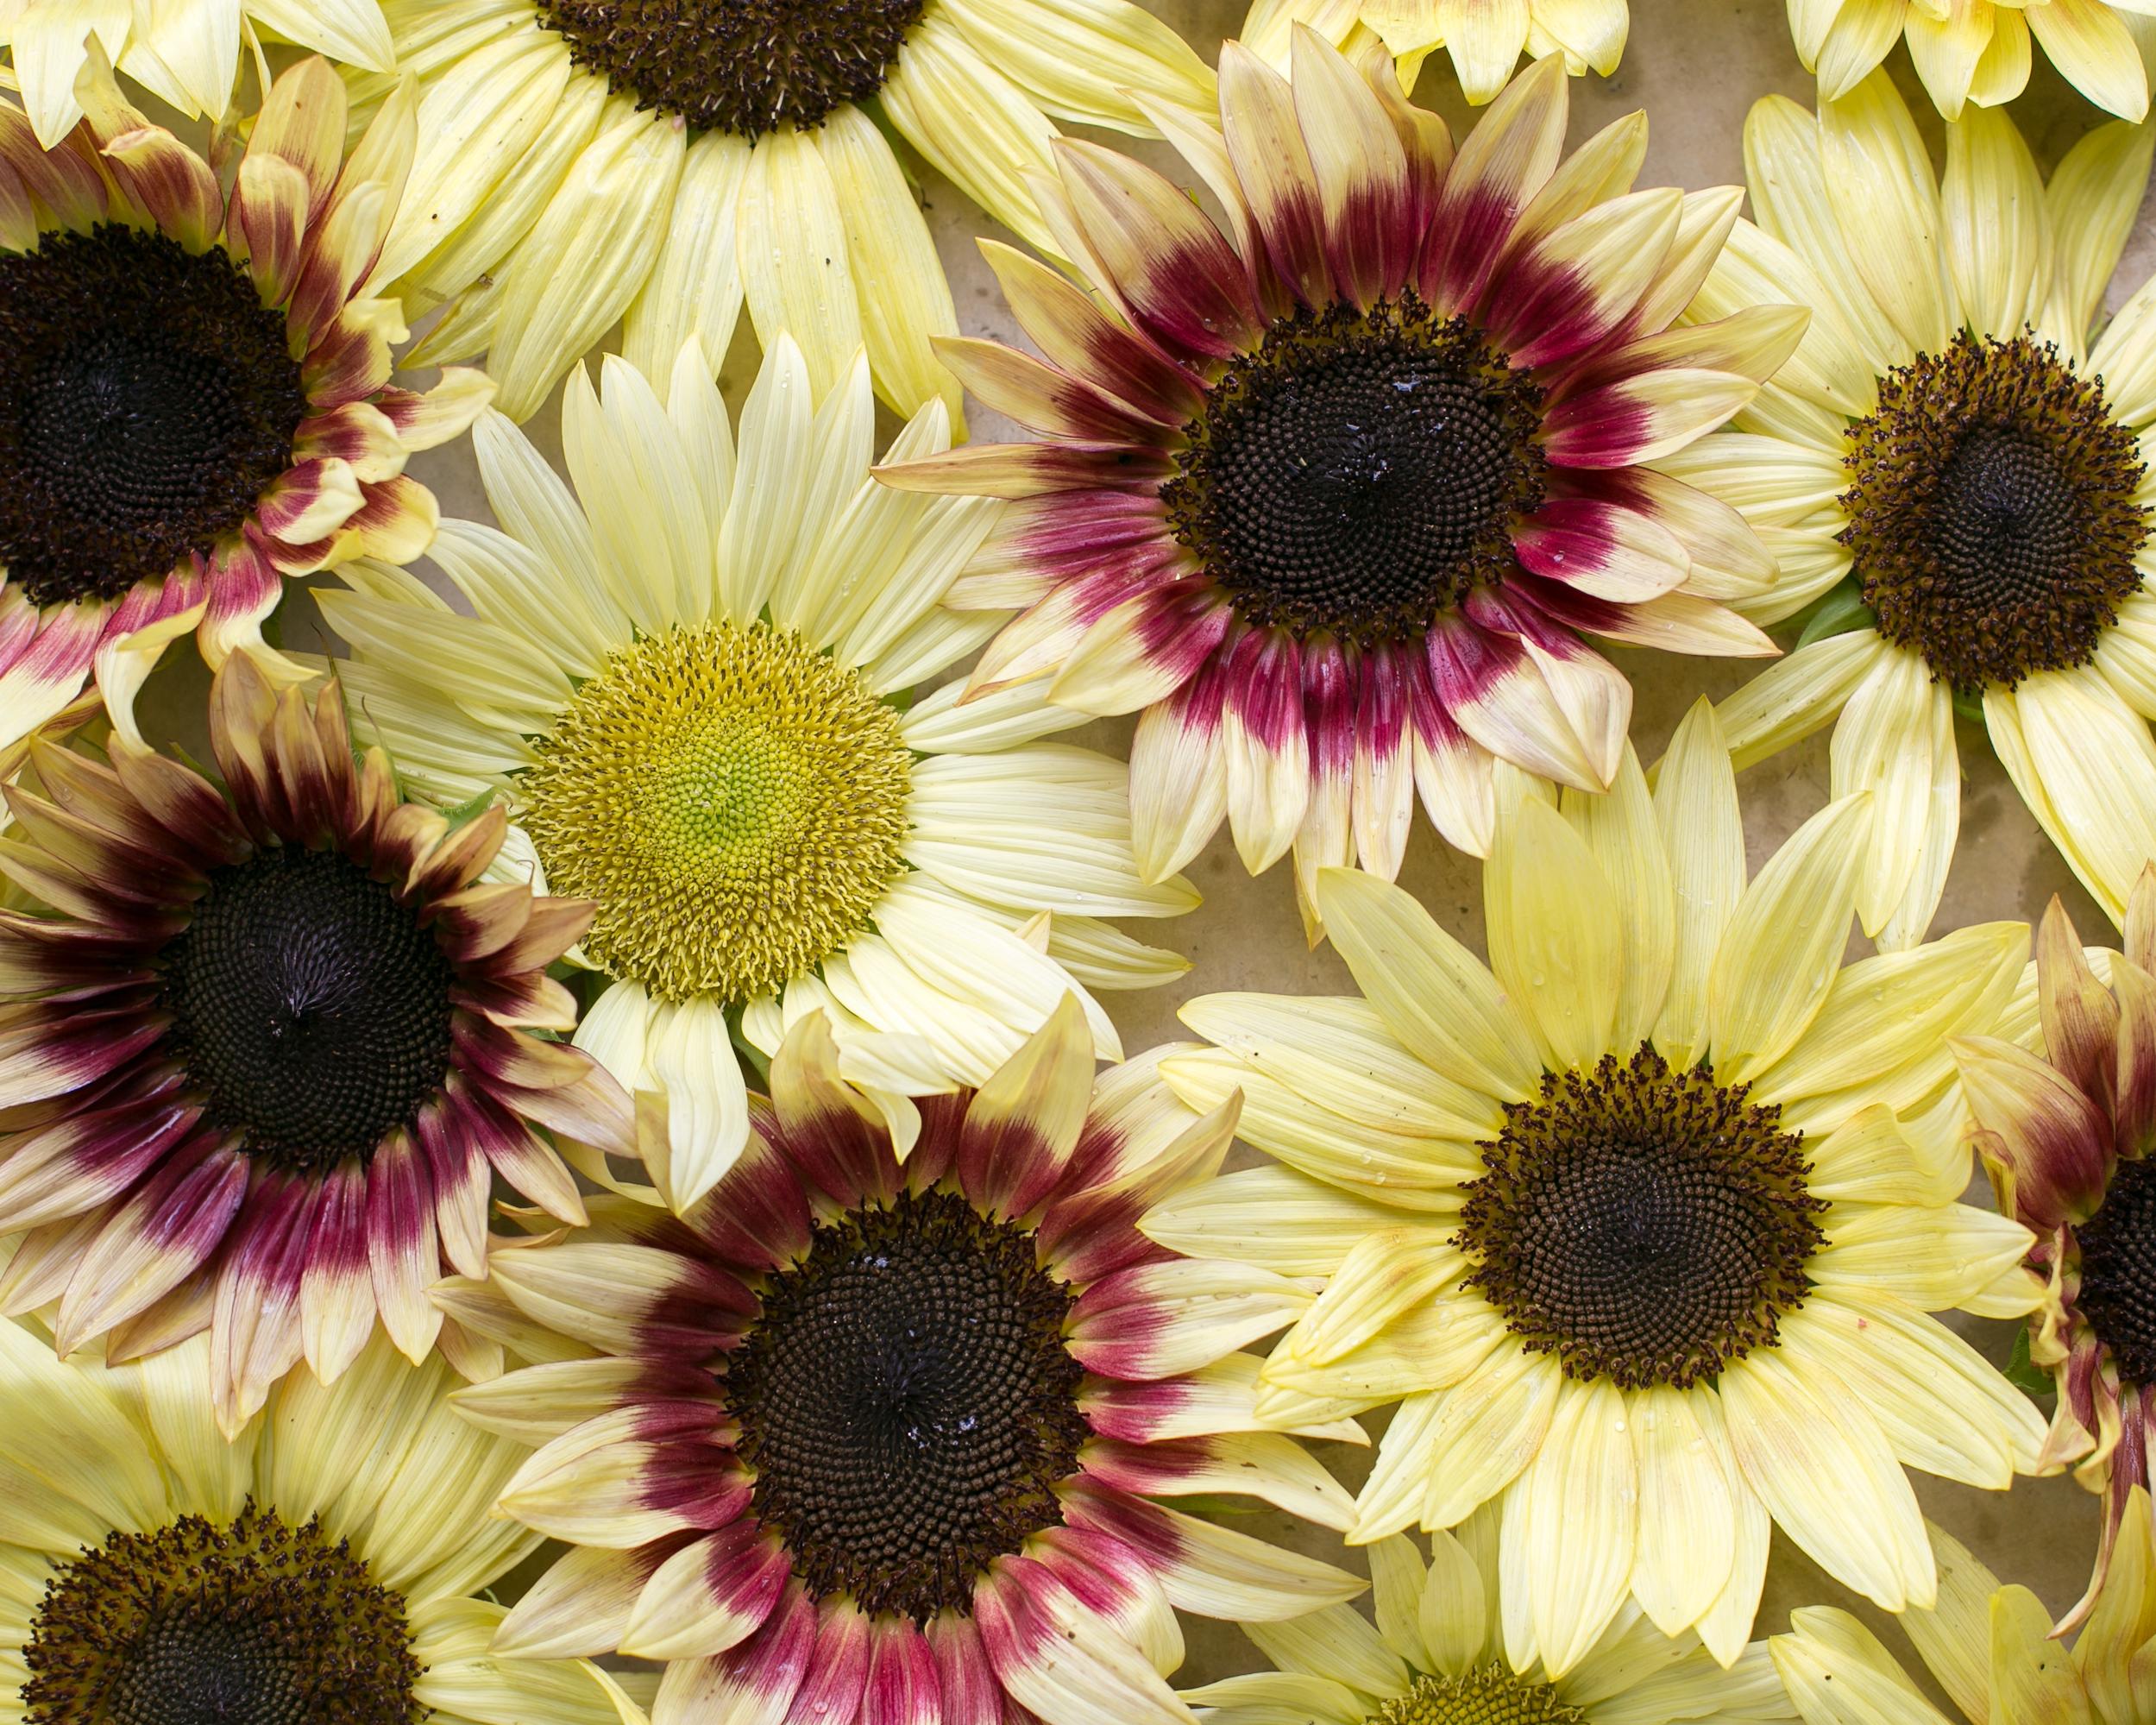 sunflowerparty-8.jpg